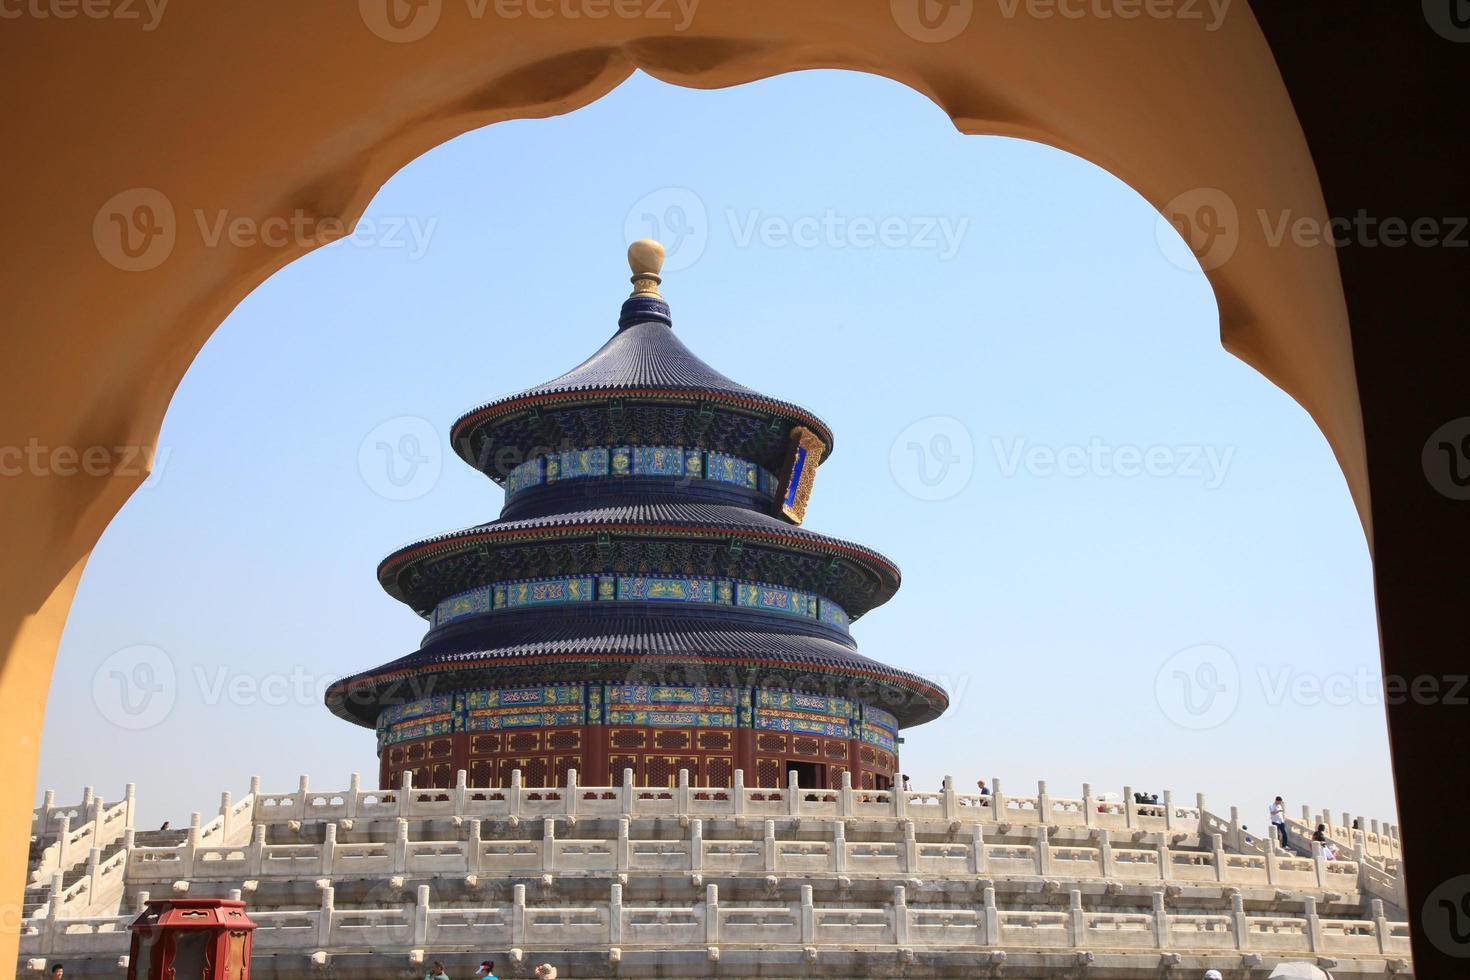 templo del cielo, beijing, china foto